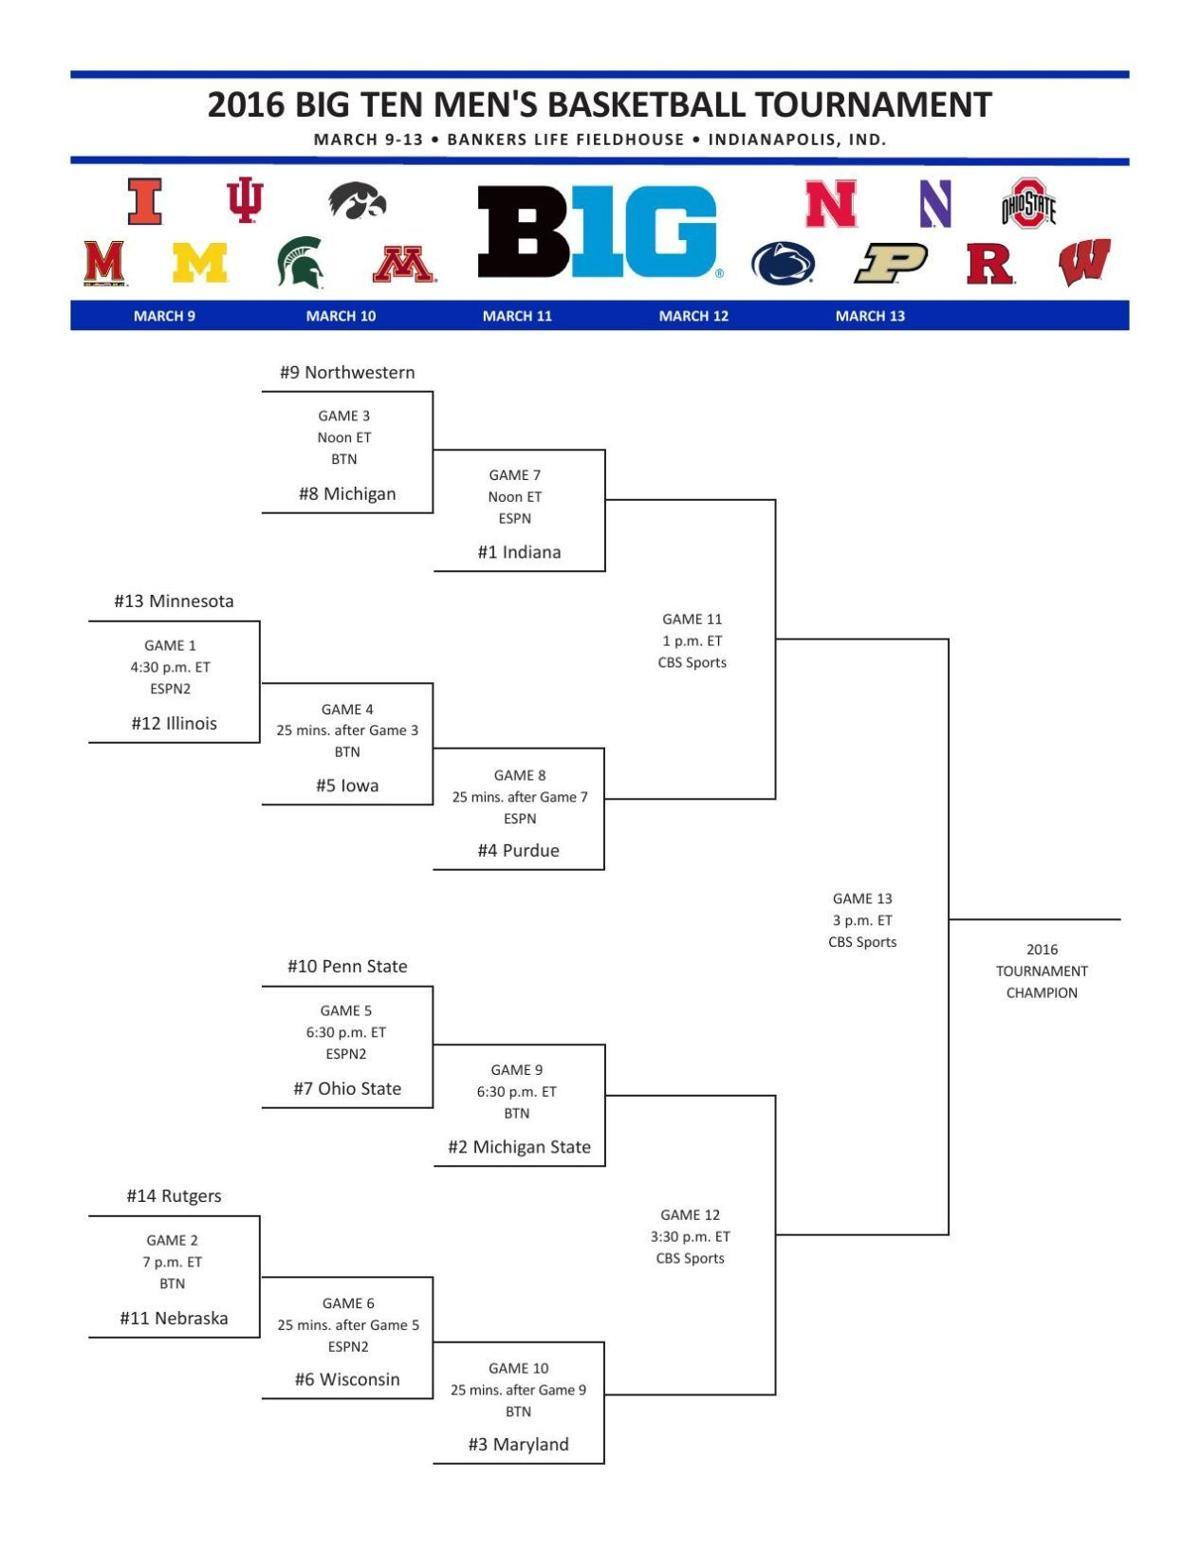 2016 Big Ten men's basketball tournament bracket